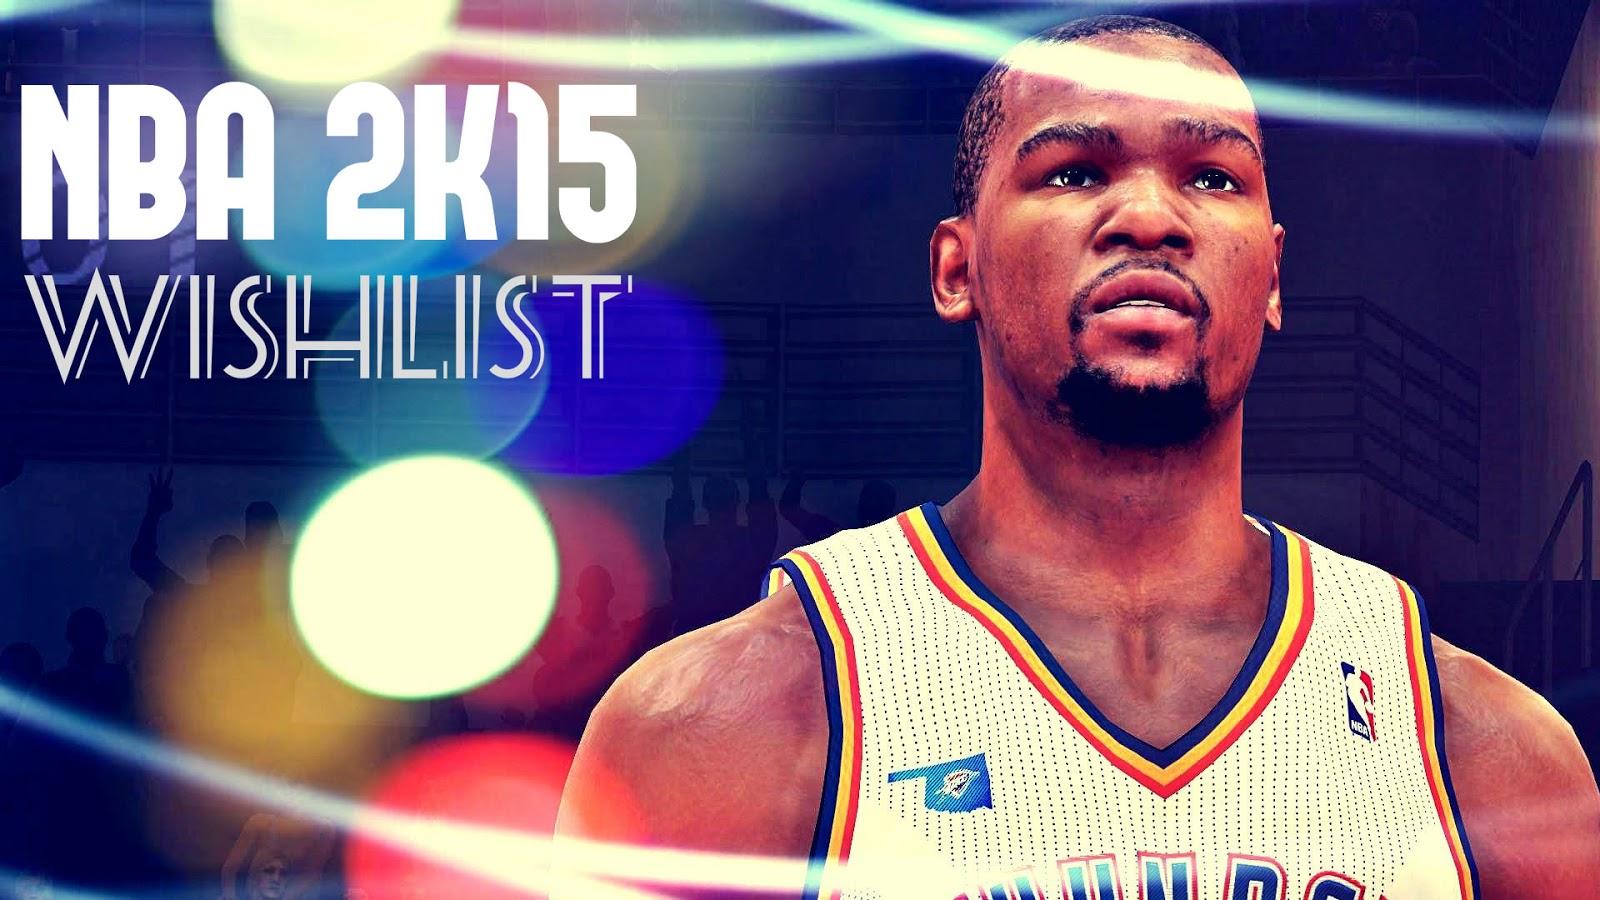 NBA 2k15 Wishlist : What do you Want your NBA 2k15 be Like?